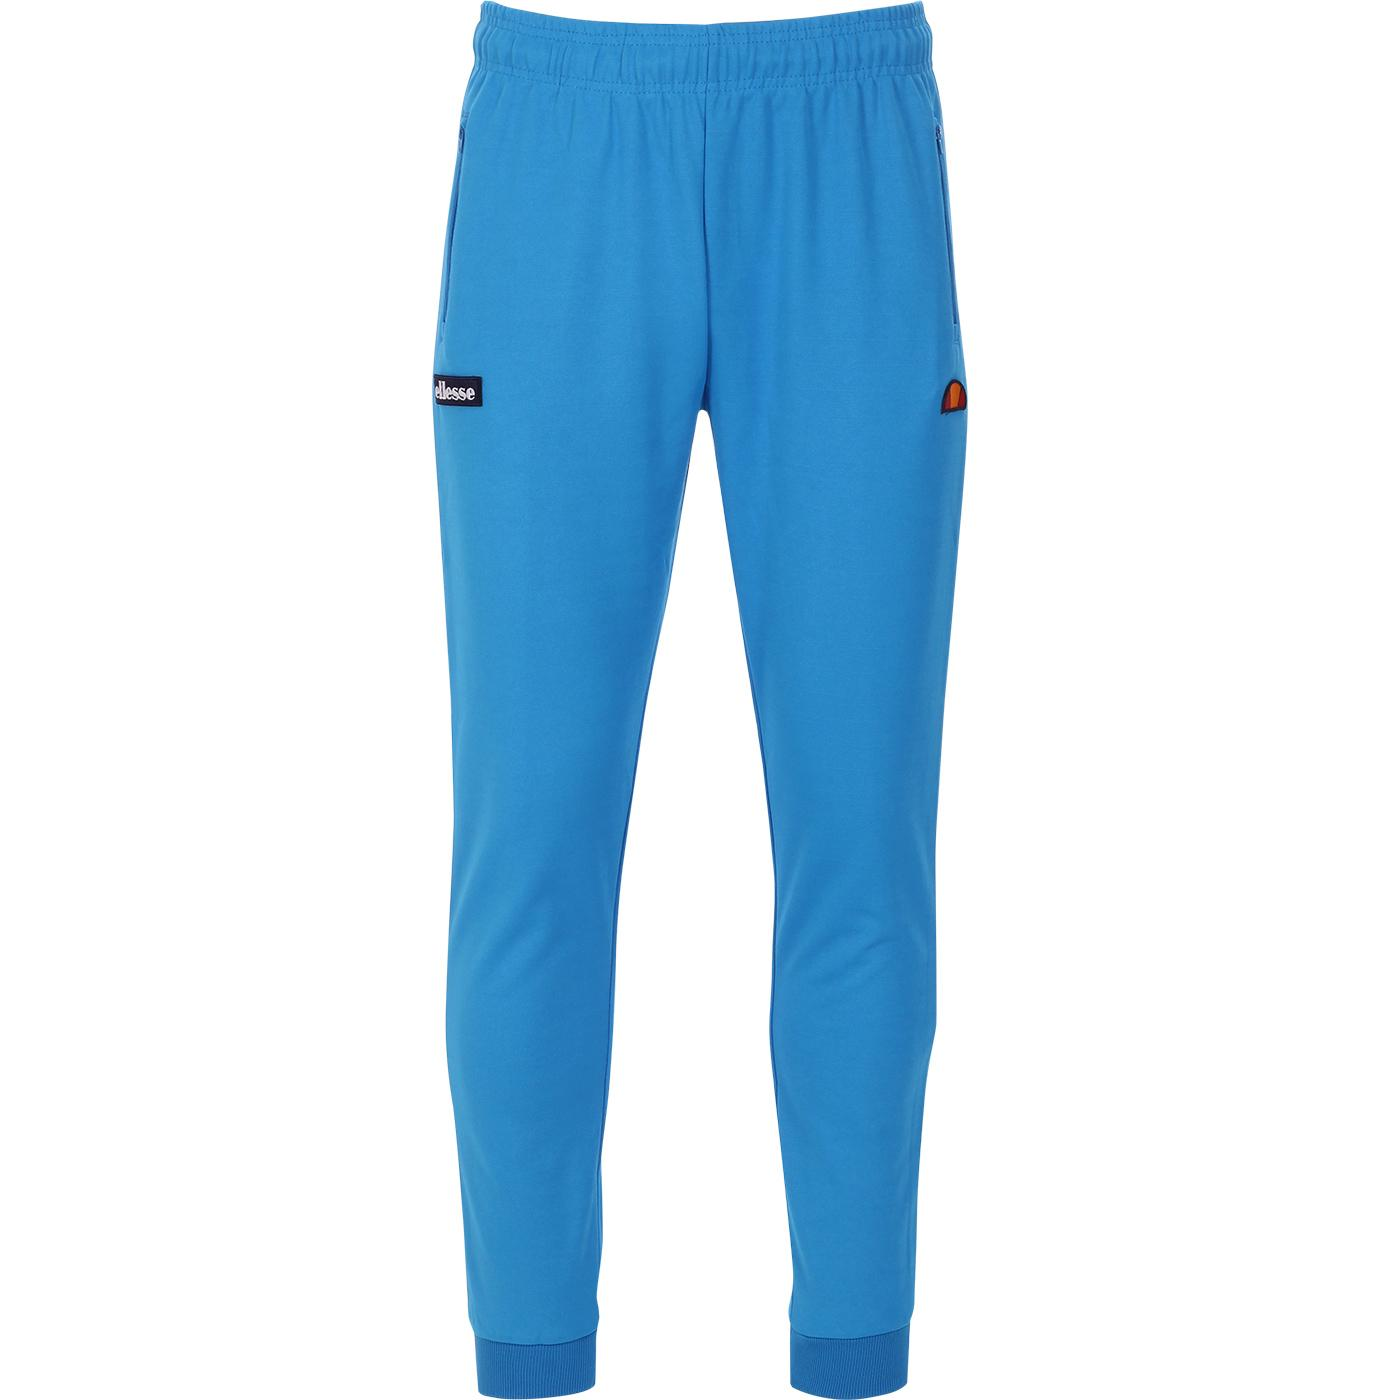 Bertoni ELLESSE Mens Retro Jogger Track Pants (BB)